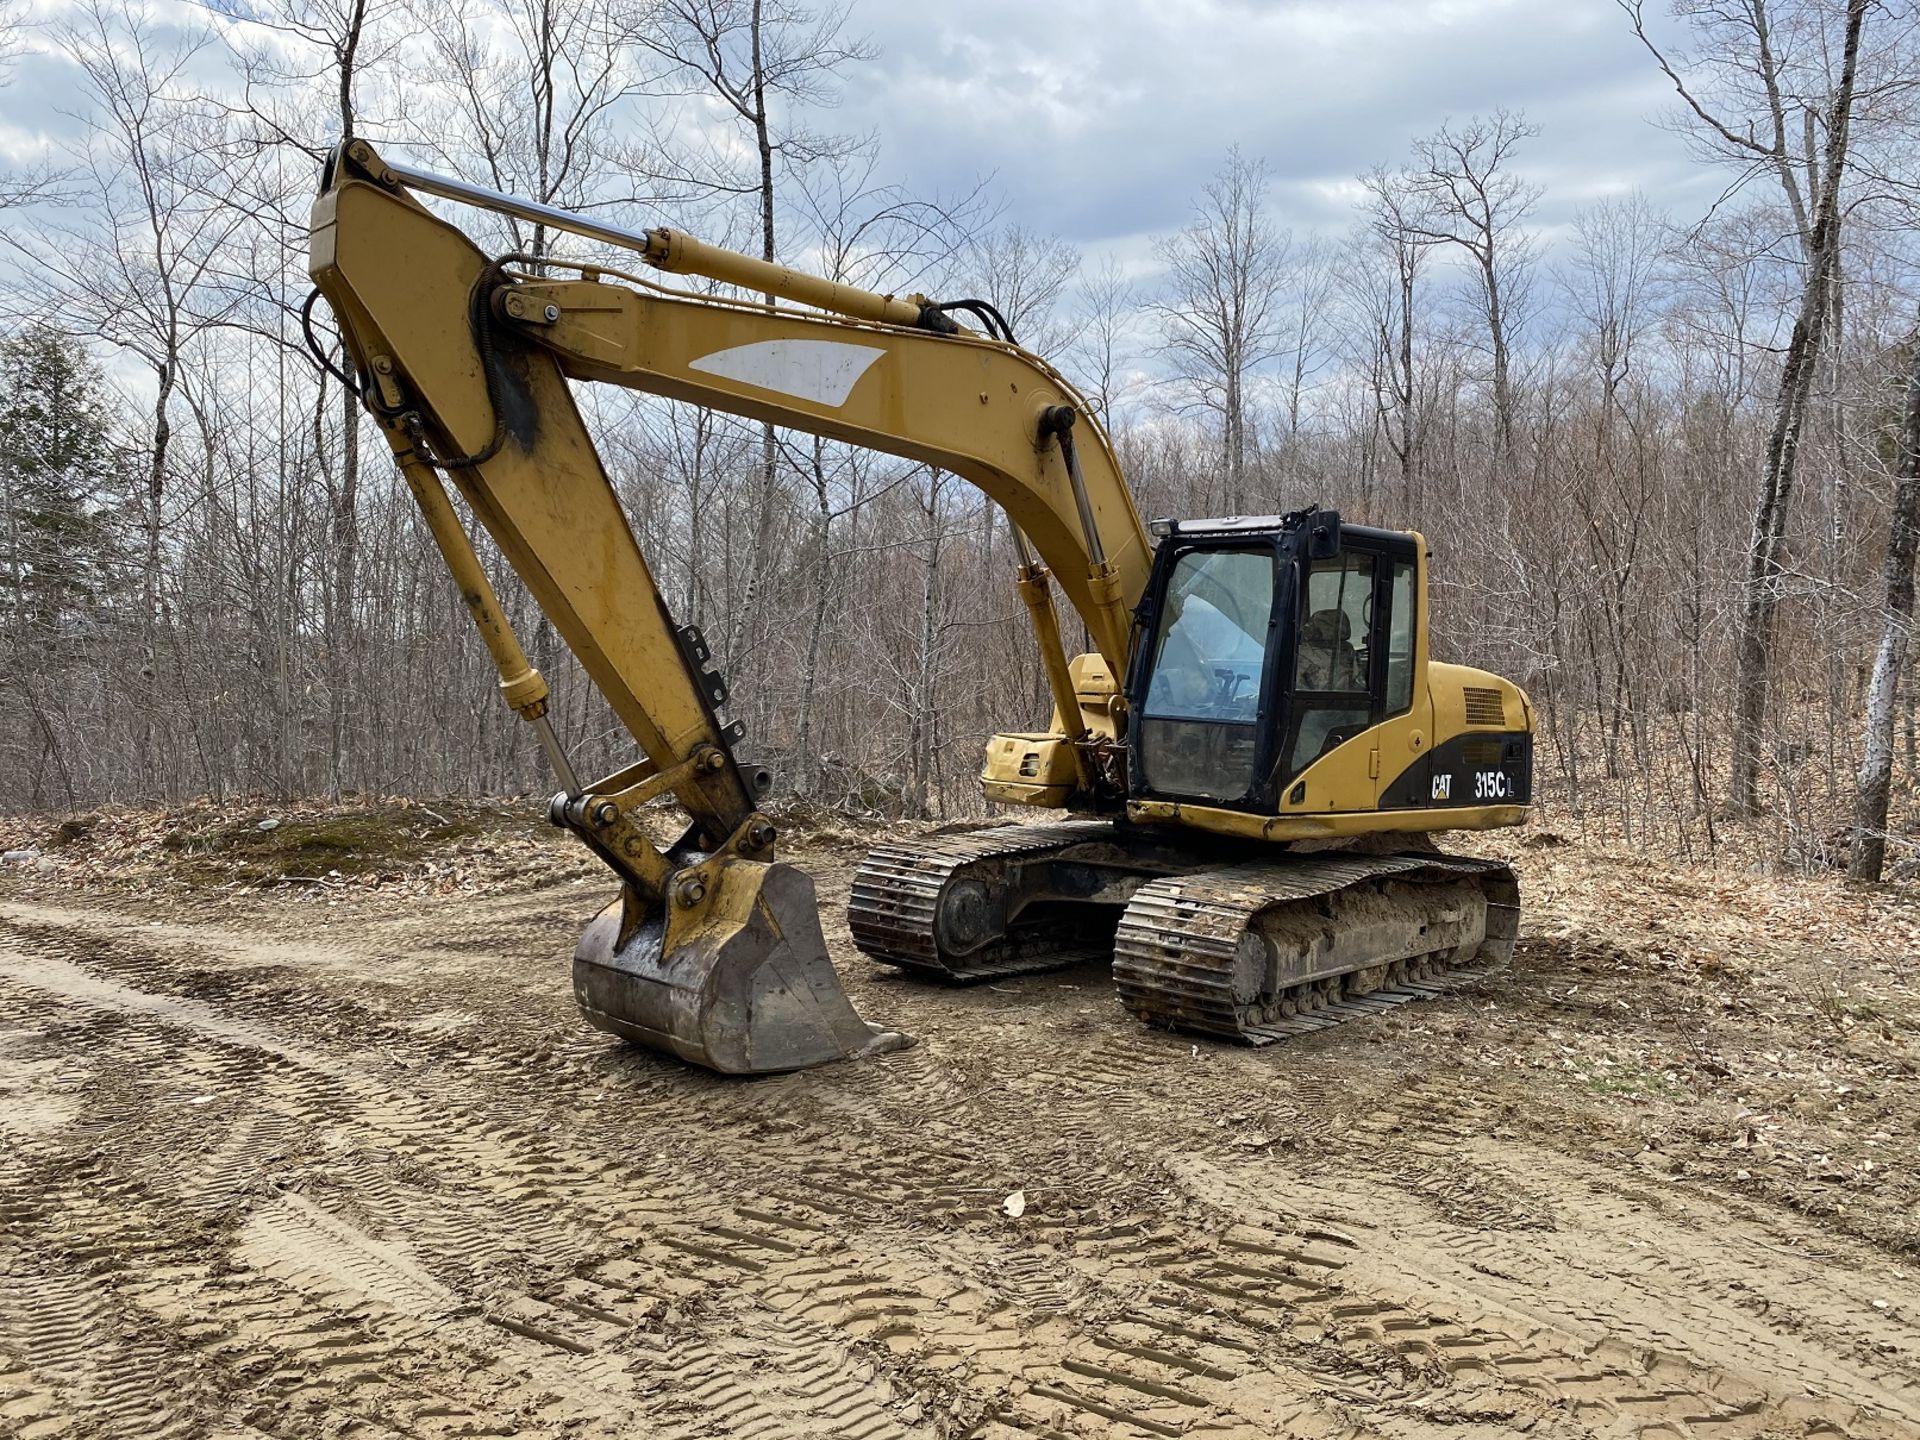 Caterpillar Excavator 315CL 1YD Bucket Stationary w/Thumb, Hrs: 8,003, 3YR Old Swing Motor Bushings,